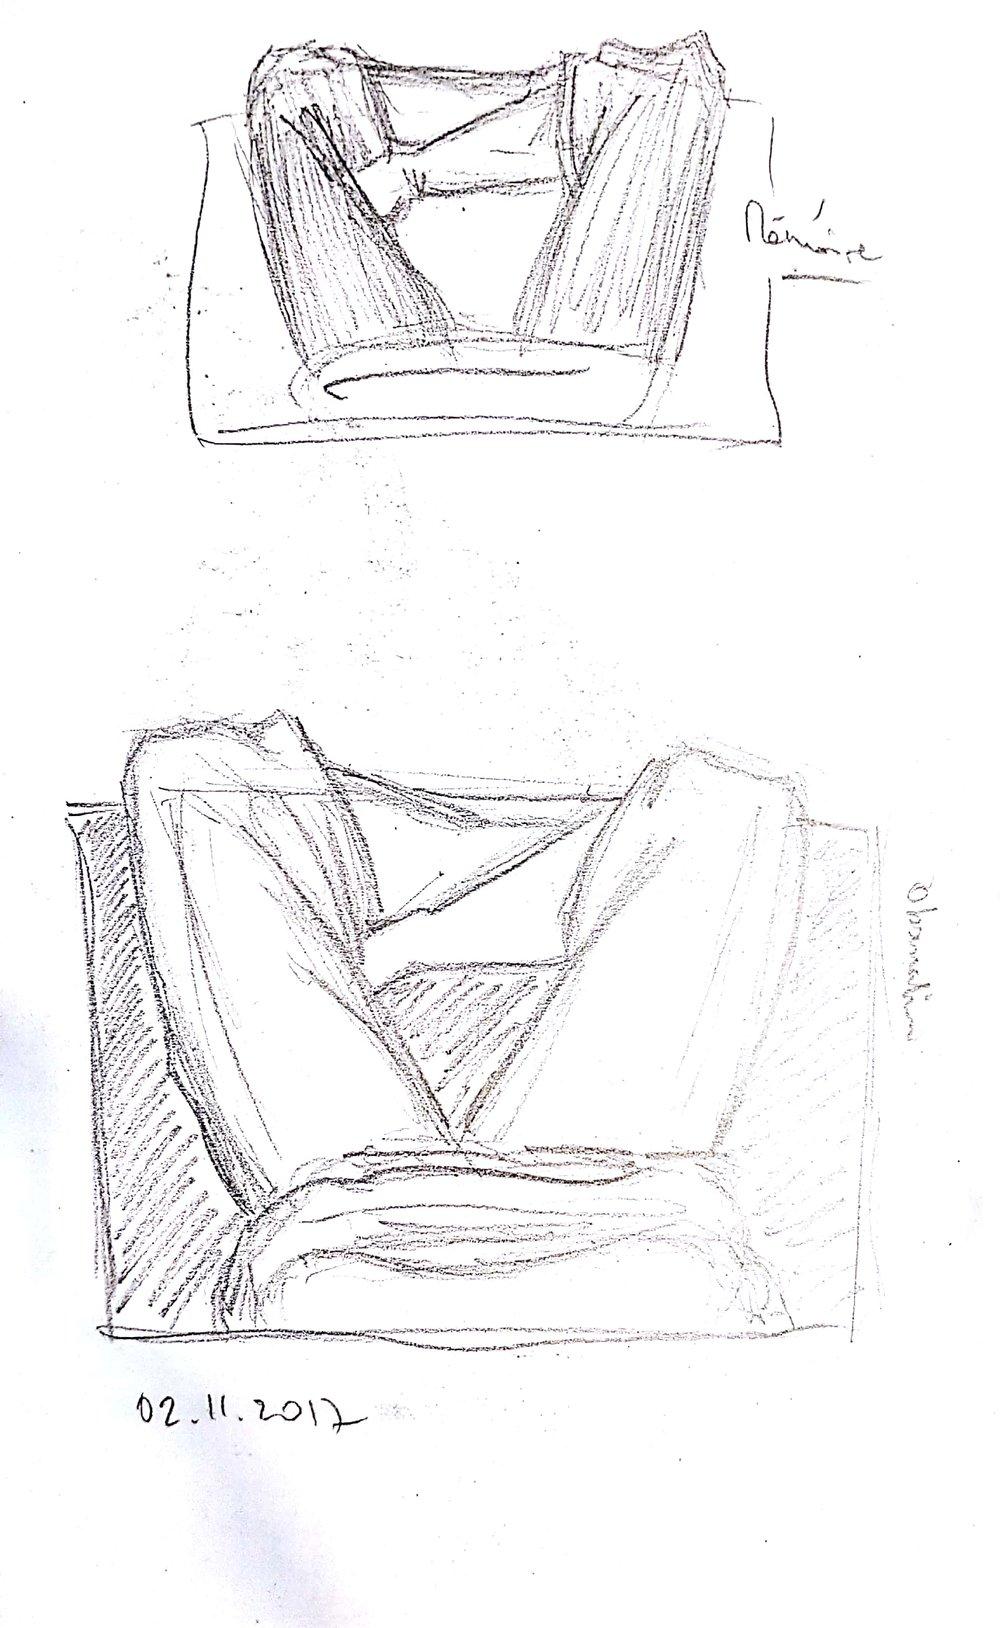 2017-11-02 dessin genoux.jpg